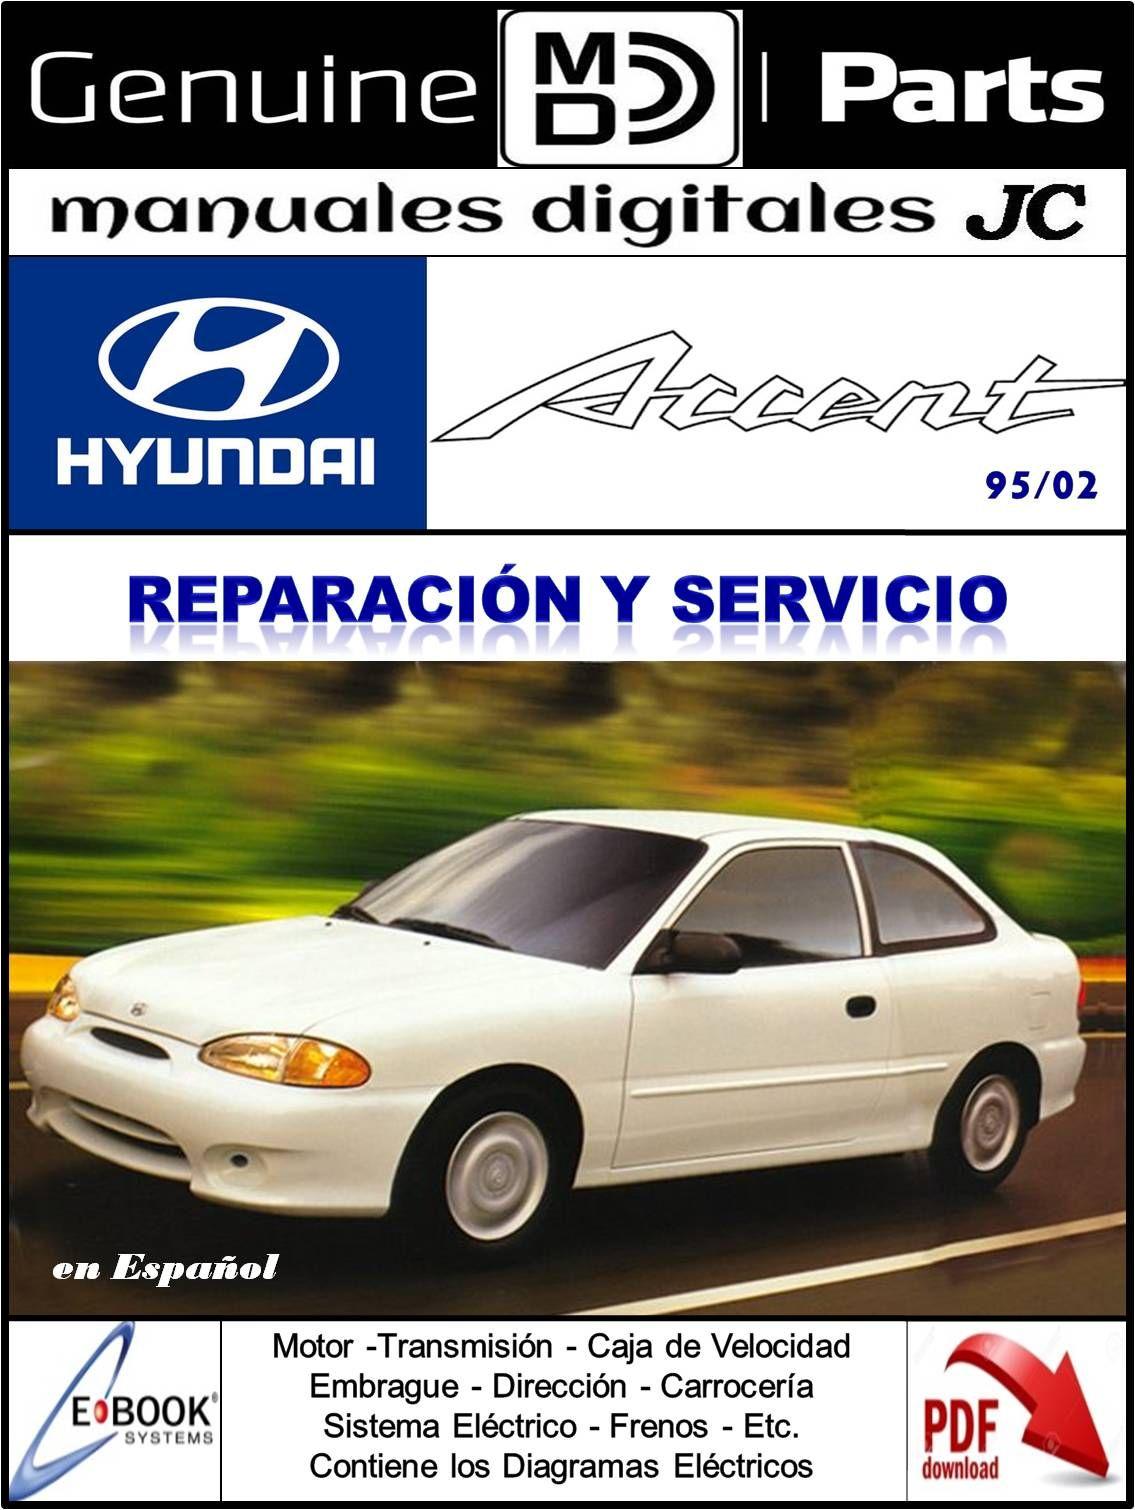 manual reparaci n y servicio hyundai accent 95 02 correo rh pinterest com manual de taller hyundai accent pdf manual de taller hyundai accent 2010